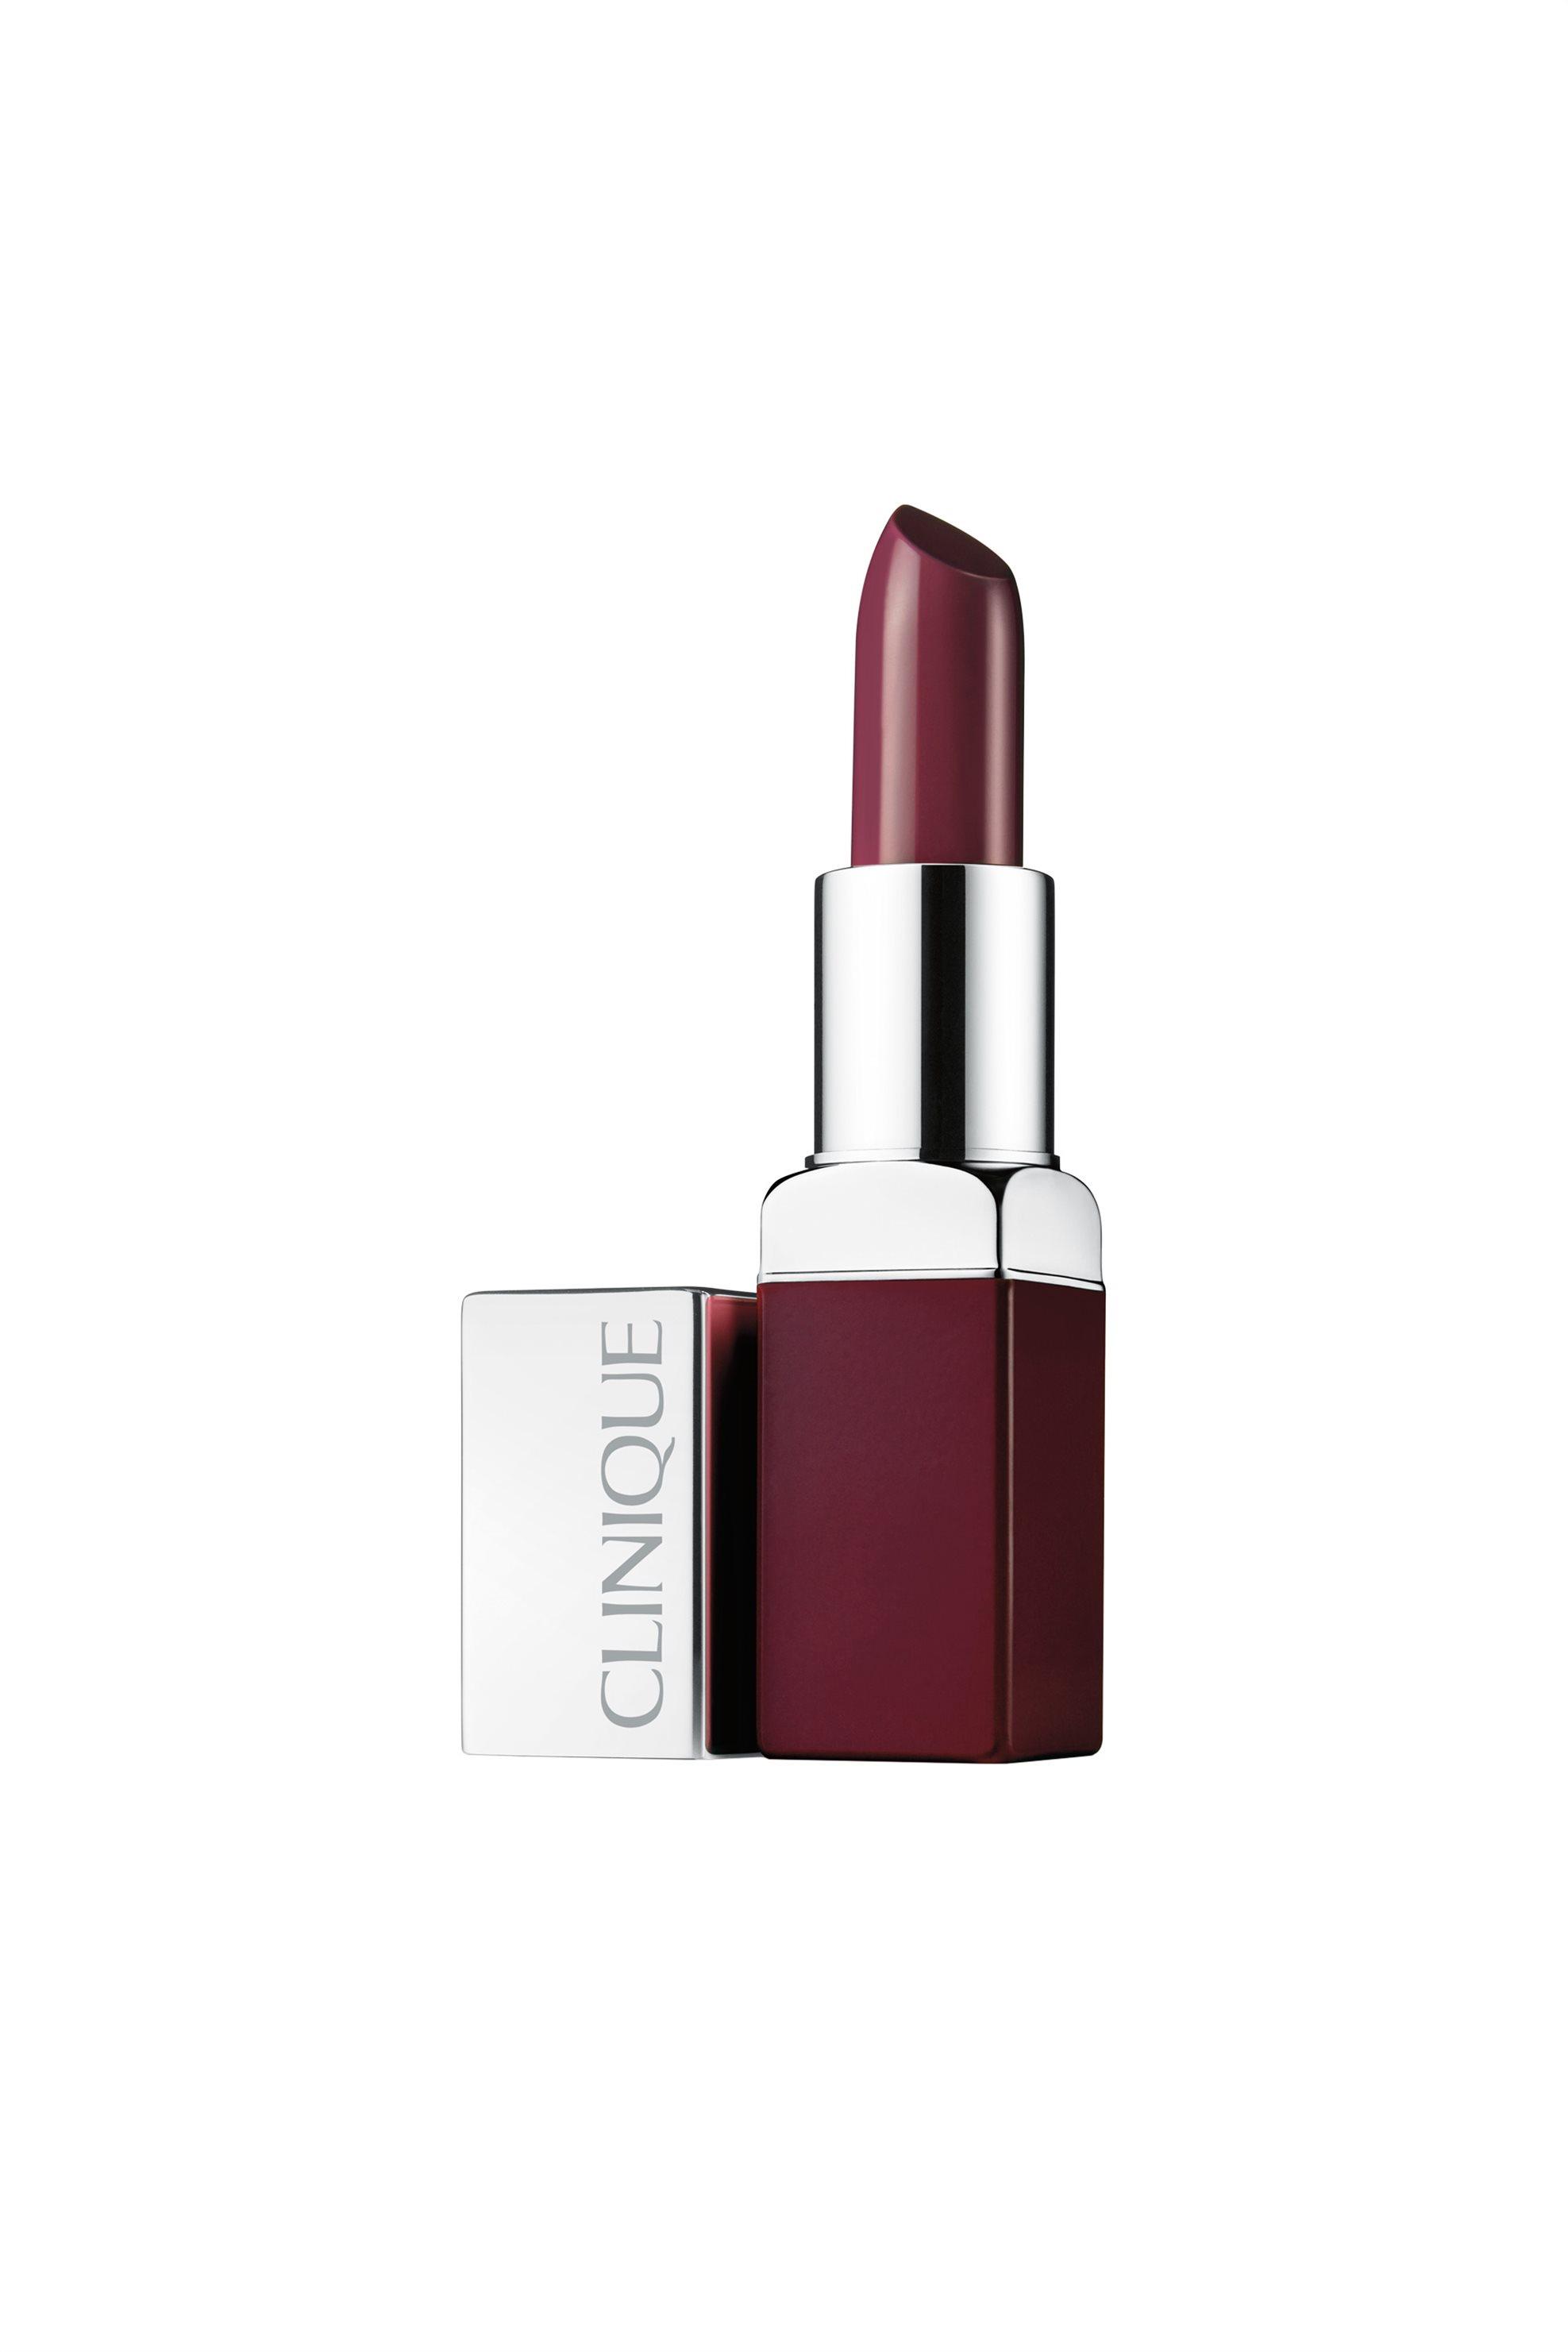 Clinique Pop™ Lip Colour + Primer 21 Rebel Pop 3.9 gr. - ZEK2210000 ομορφια   καλλυντικα επιλεκτικησ   μακιγιάζ   χείλη   κραγιόν